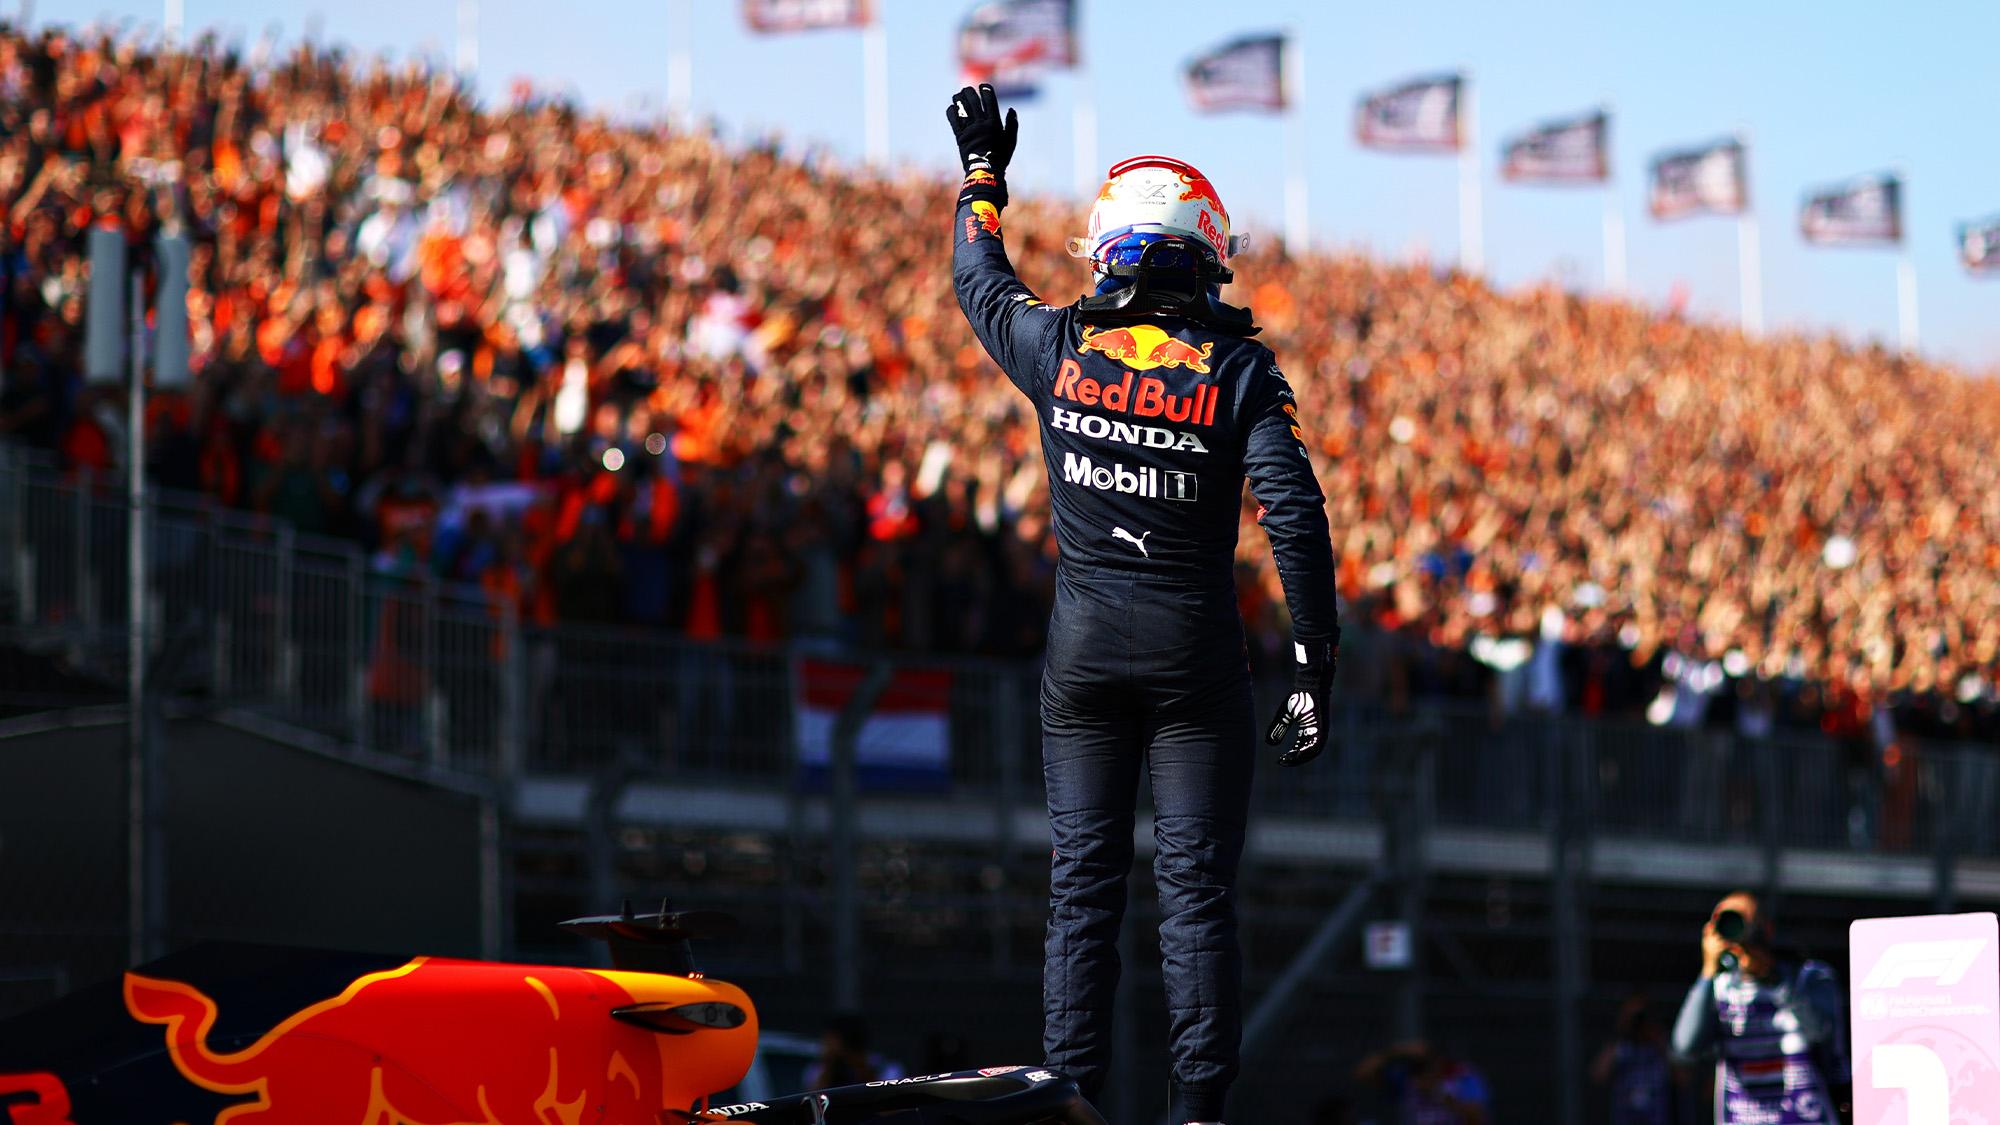 Max Verstappen celebrates pole at 2021 Dutch GP with orange army